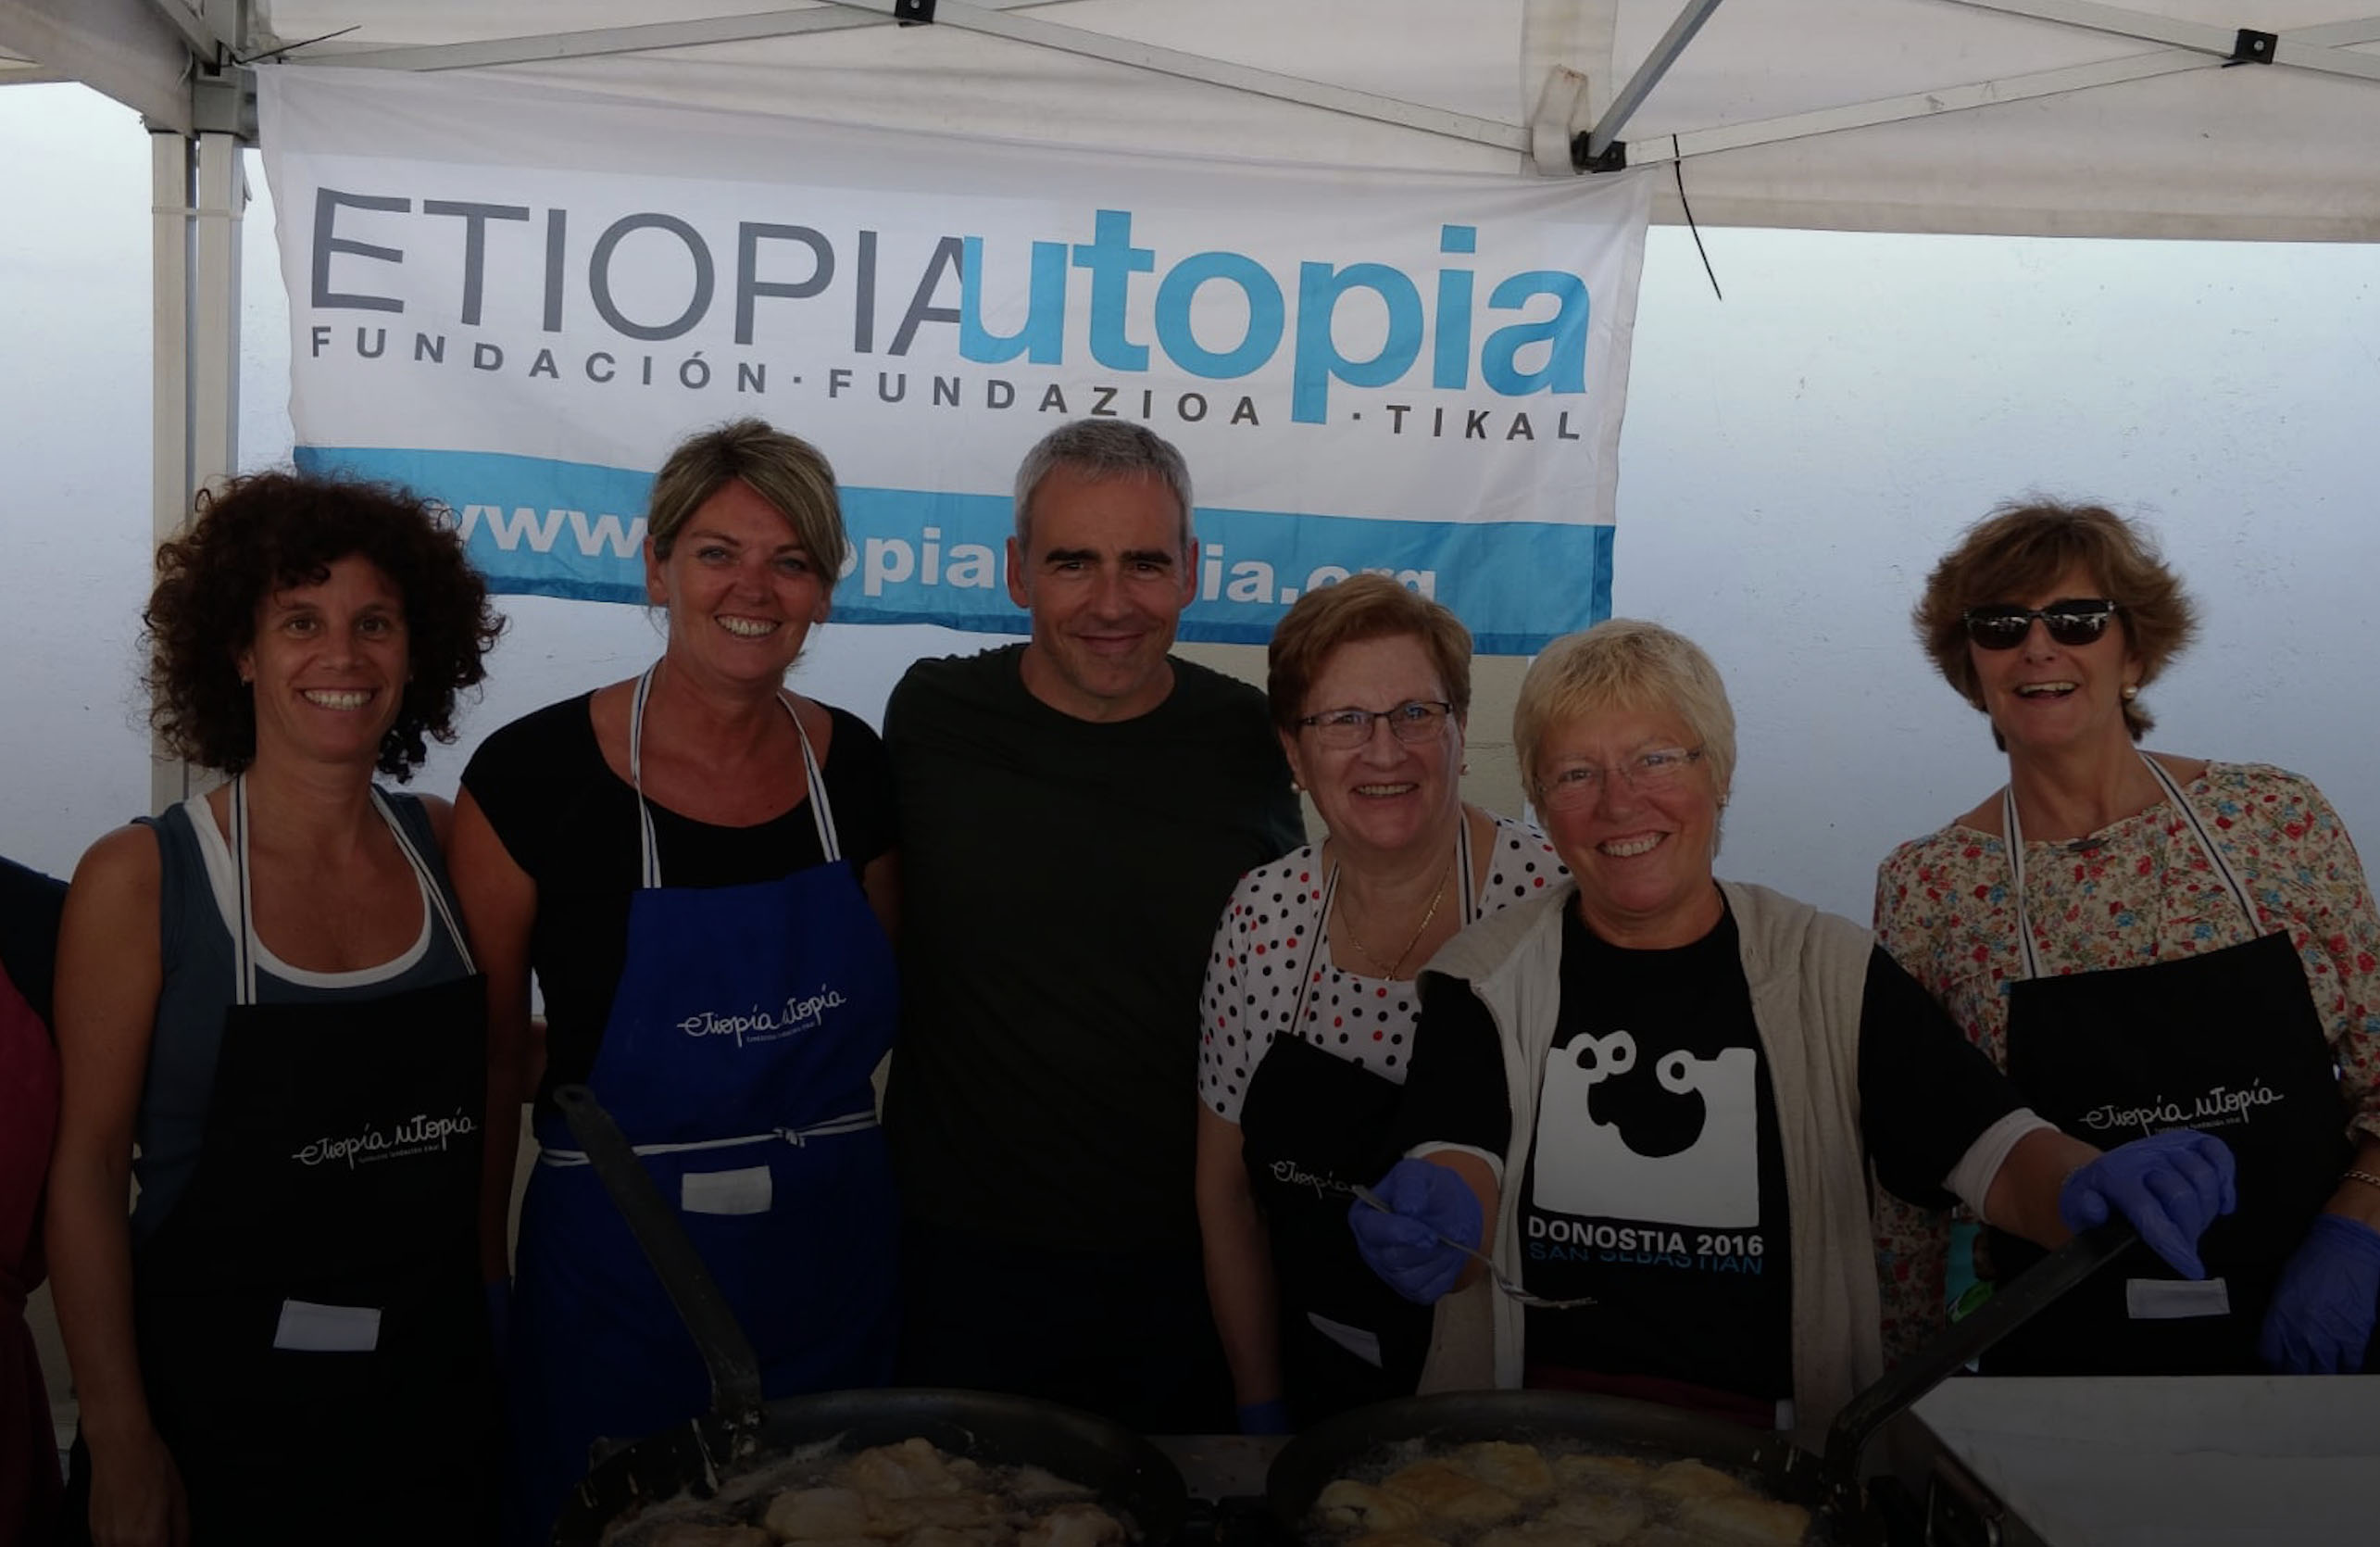 Colaborar con Etiopia Utopia